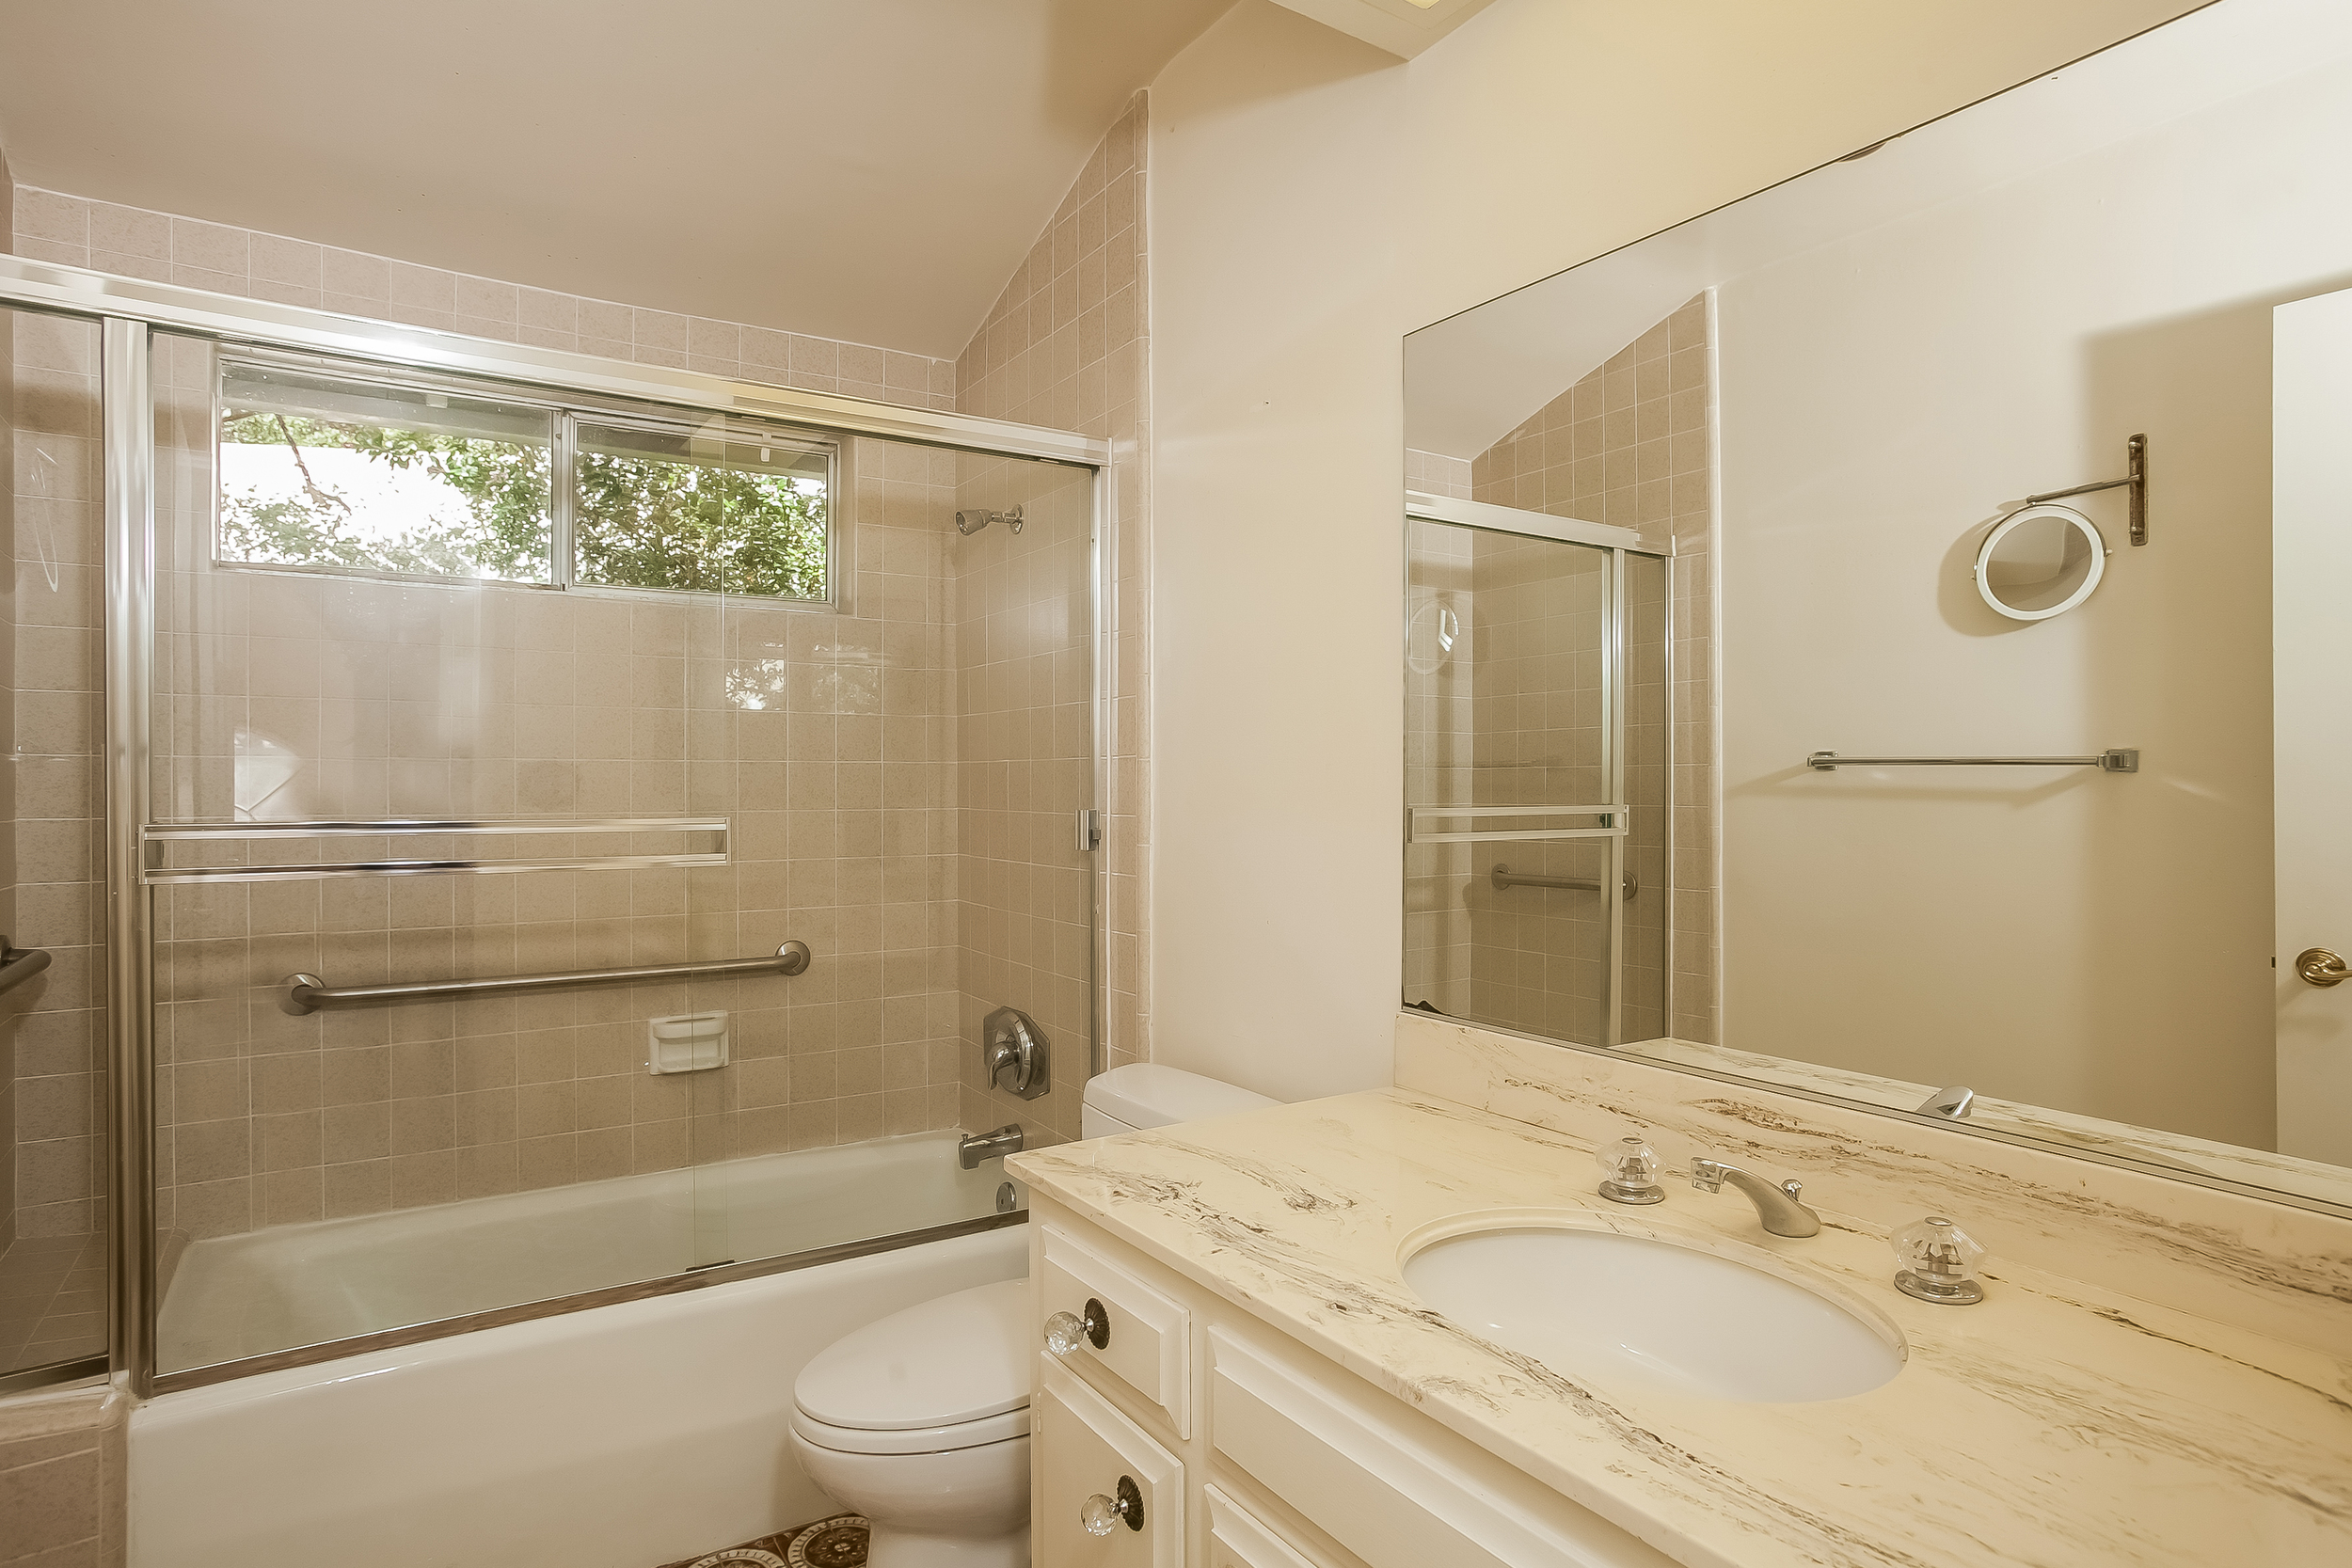 028-Bathroom-2804406-large.jpg